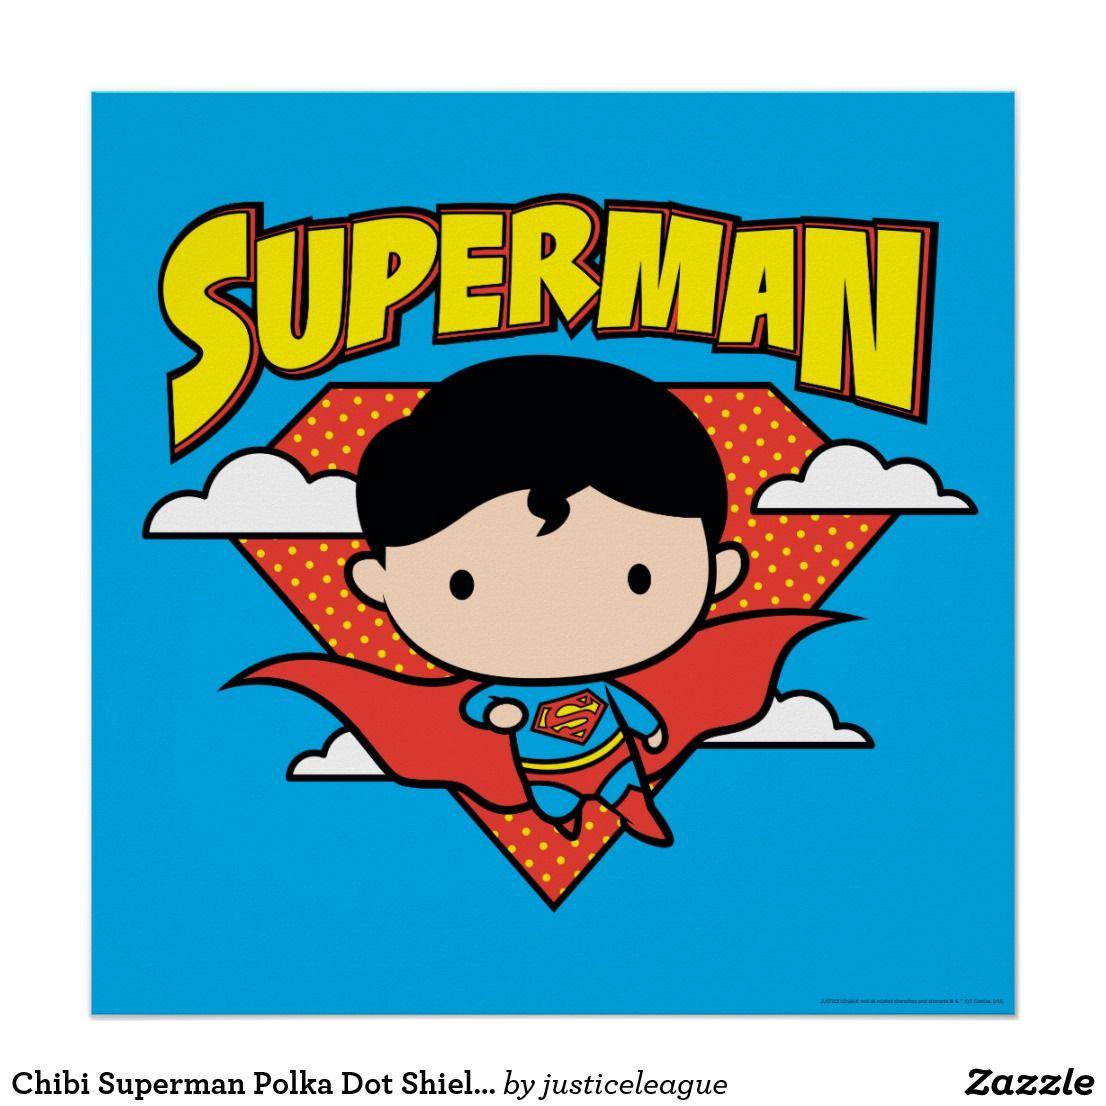 Chibi Superman Polka Dot Shield And Name Poster In 2018 Justice Bott Funko Pop Jl Cyborg Mugs Posters Hats Bags Stickers Backpacks Tons More Wonderwomen Greenlantern Flash Batman Comicbook Heroine